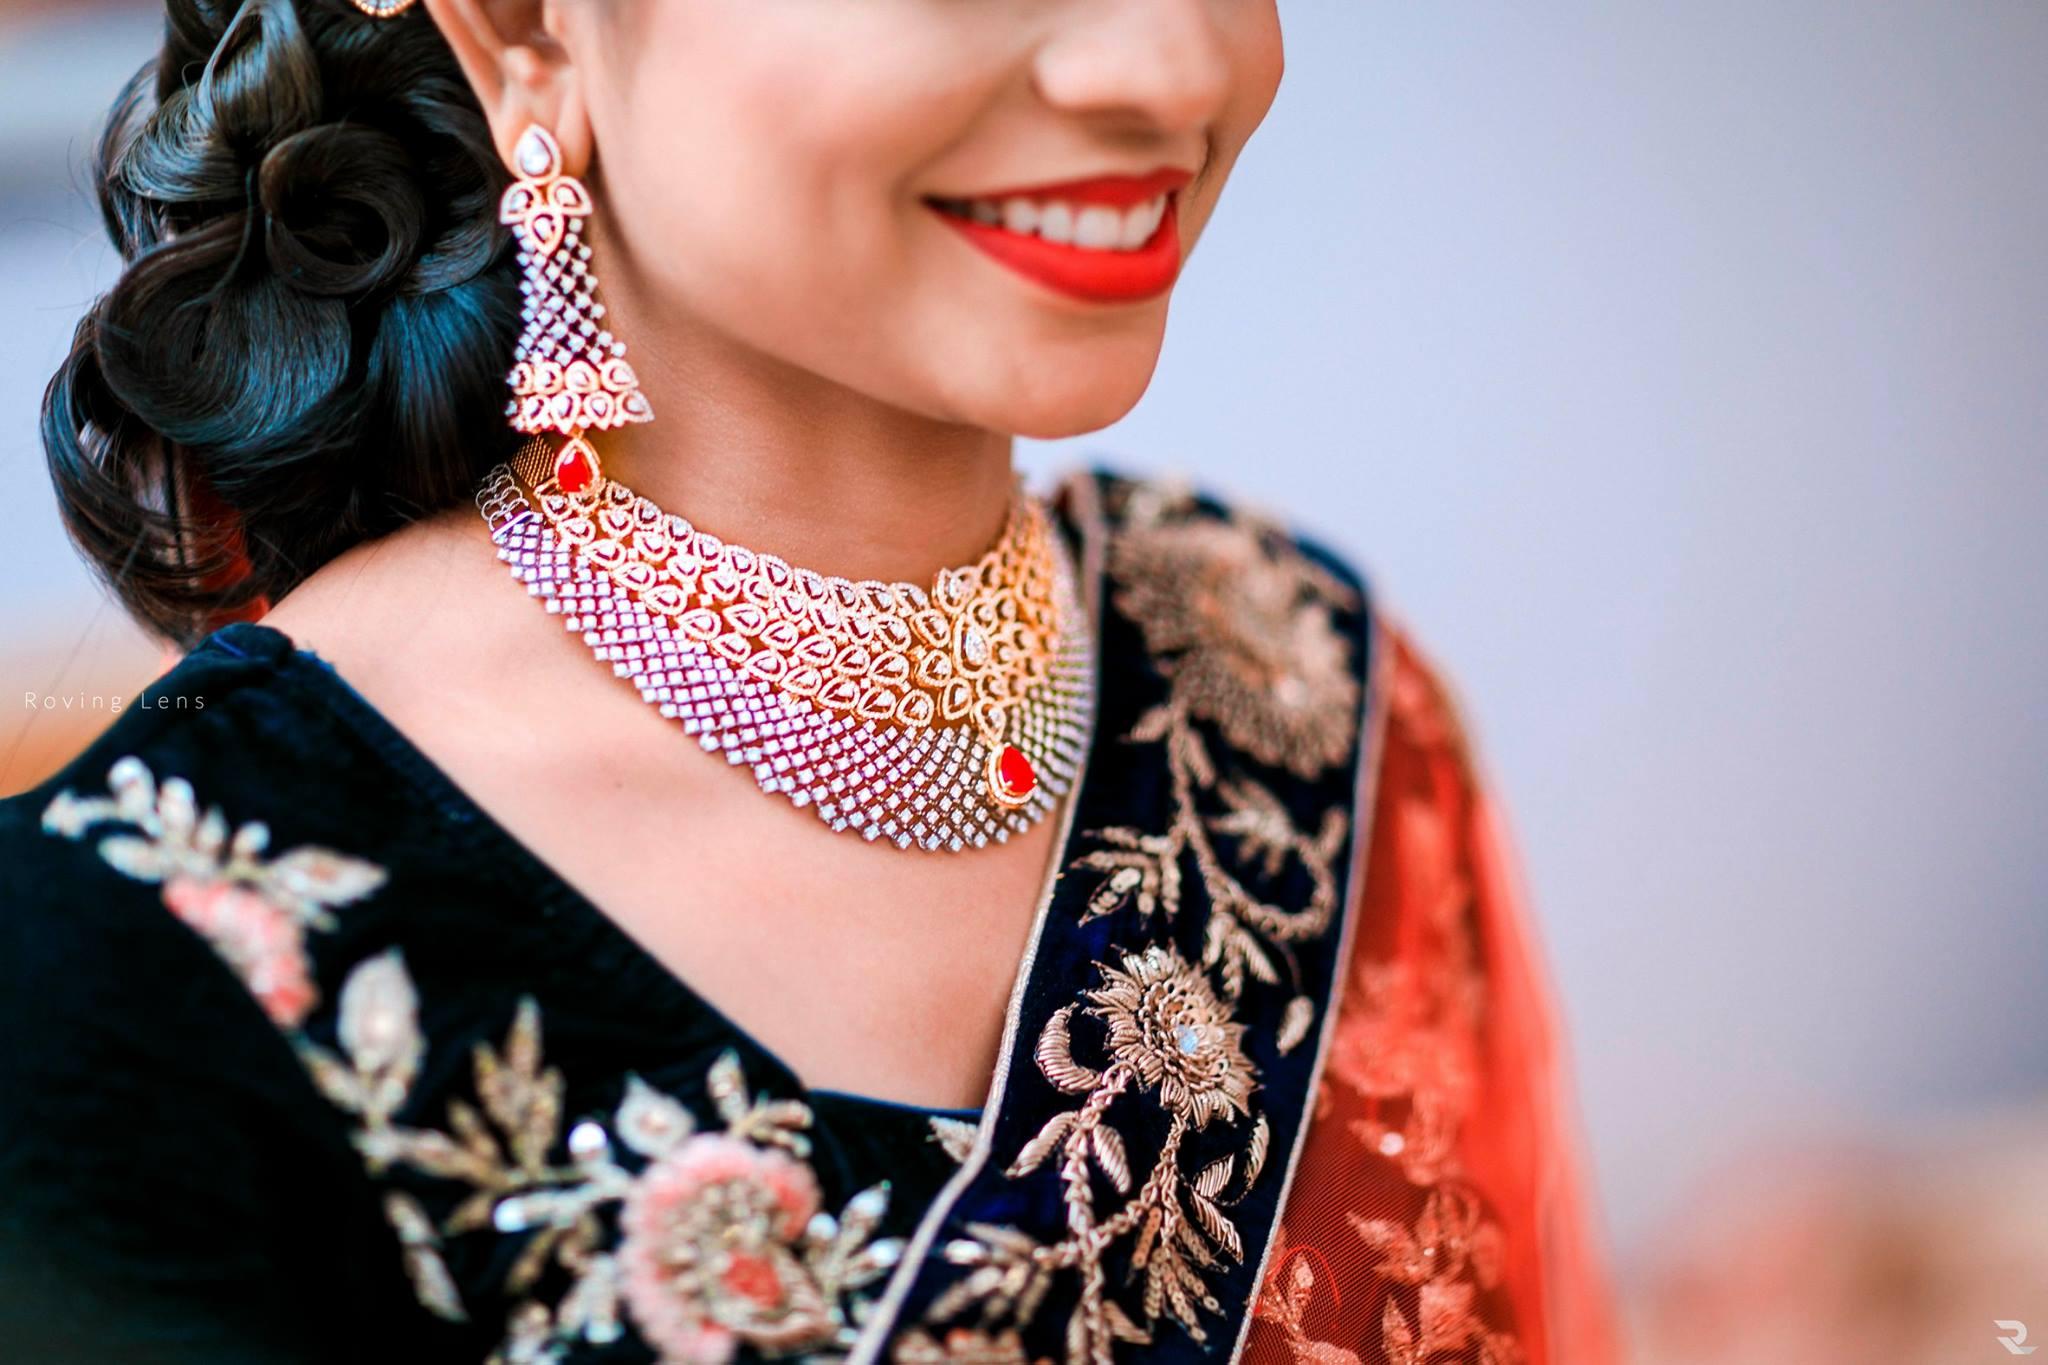 Artistic Diamond Jewelry with Red stone